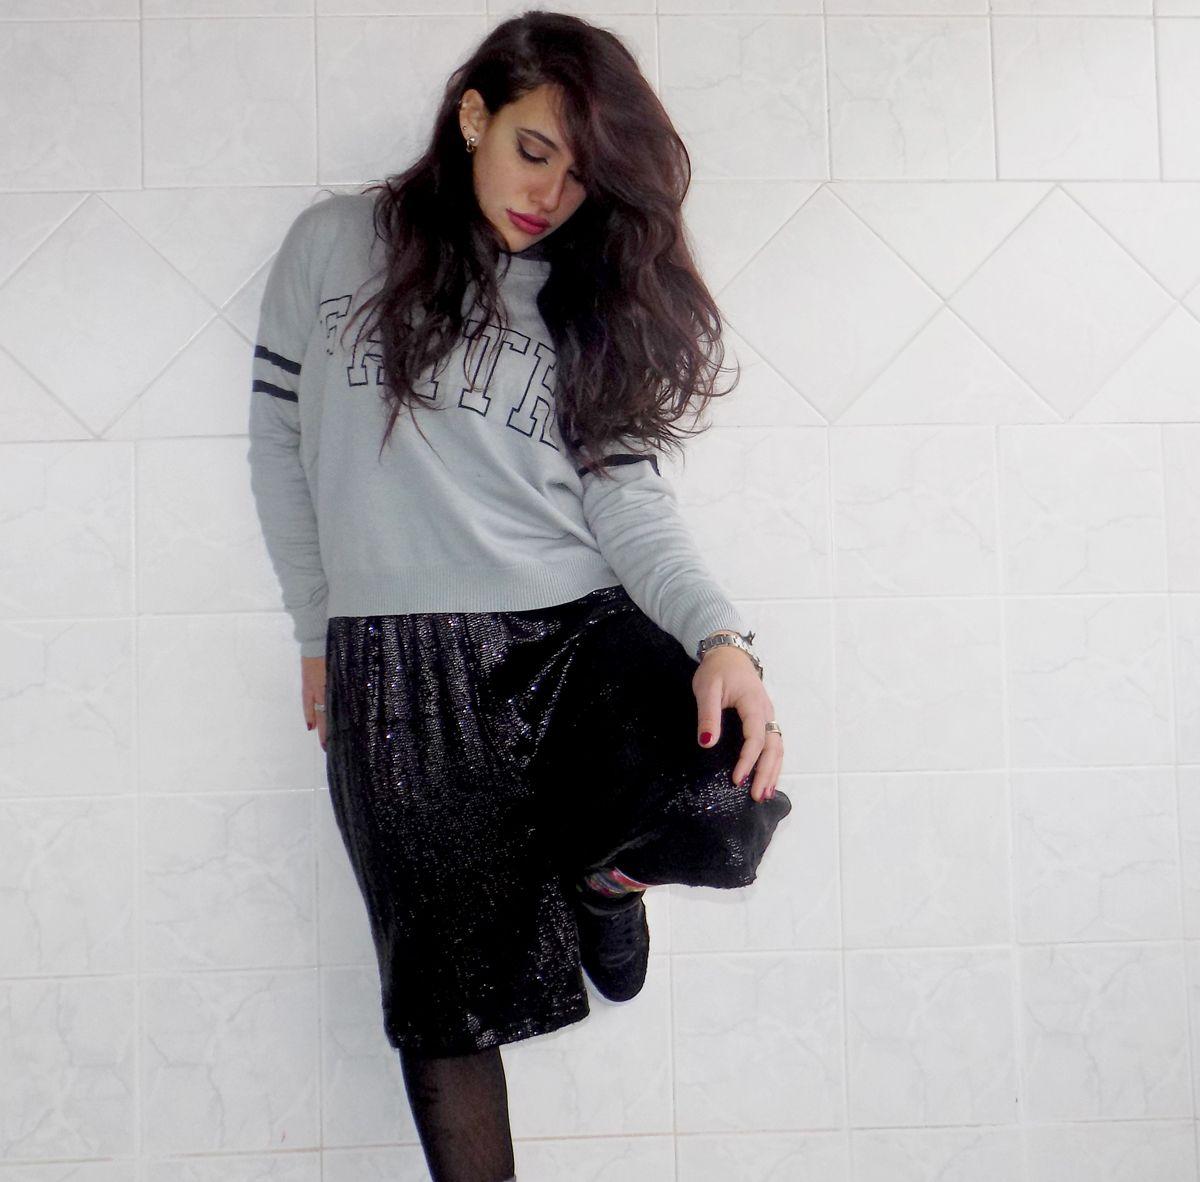 CULOTTES 2016 http://ivanavitabile.com/2016/02/pantaloni-culottes-must-2016/ #fashion #style #outfit #outfitideas #culottes #pantaoniculottes #trend #ivanaavitabile #blogger